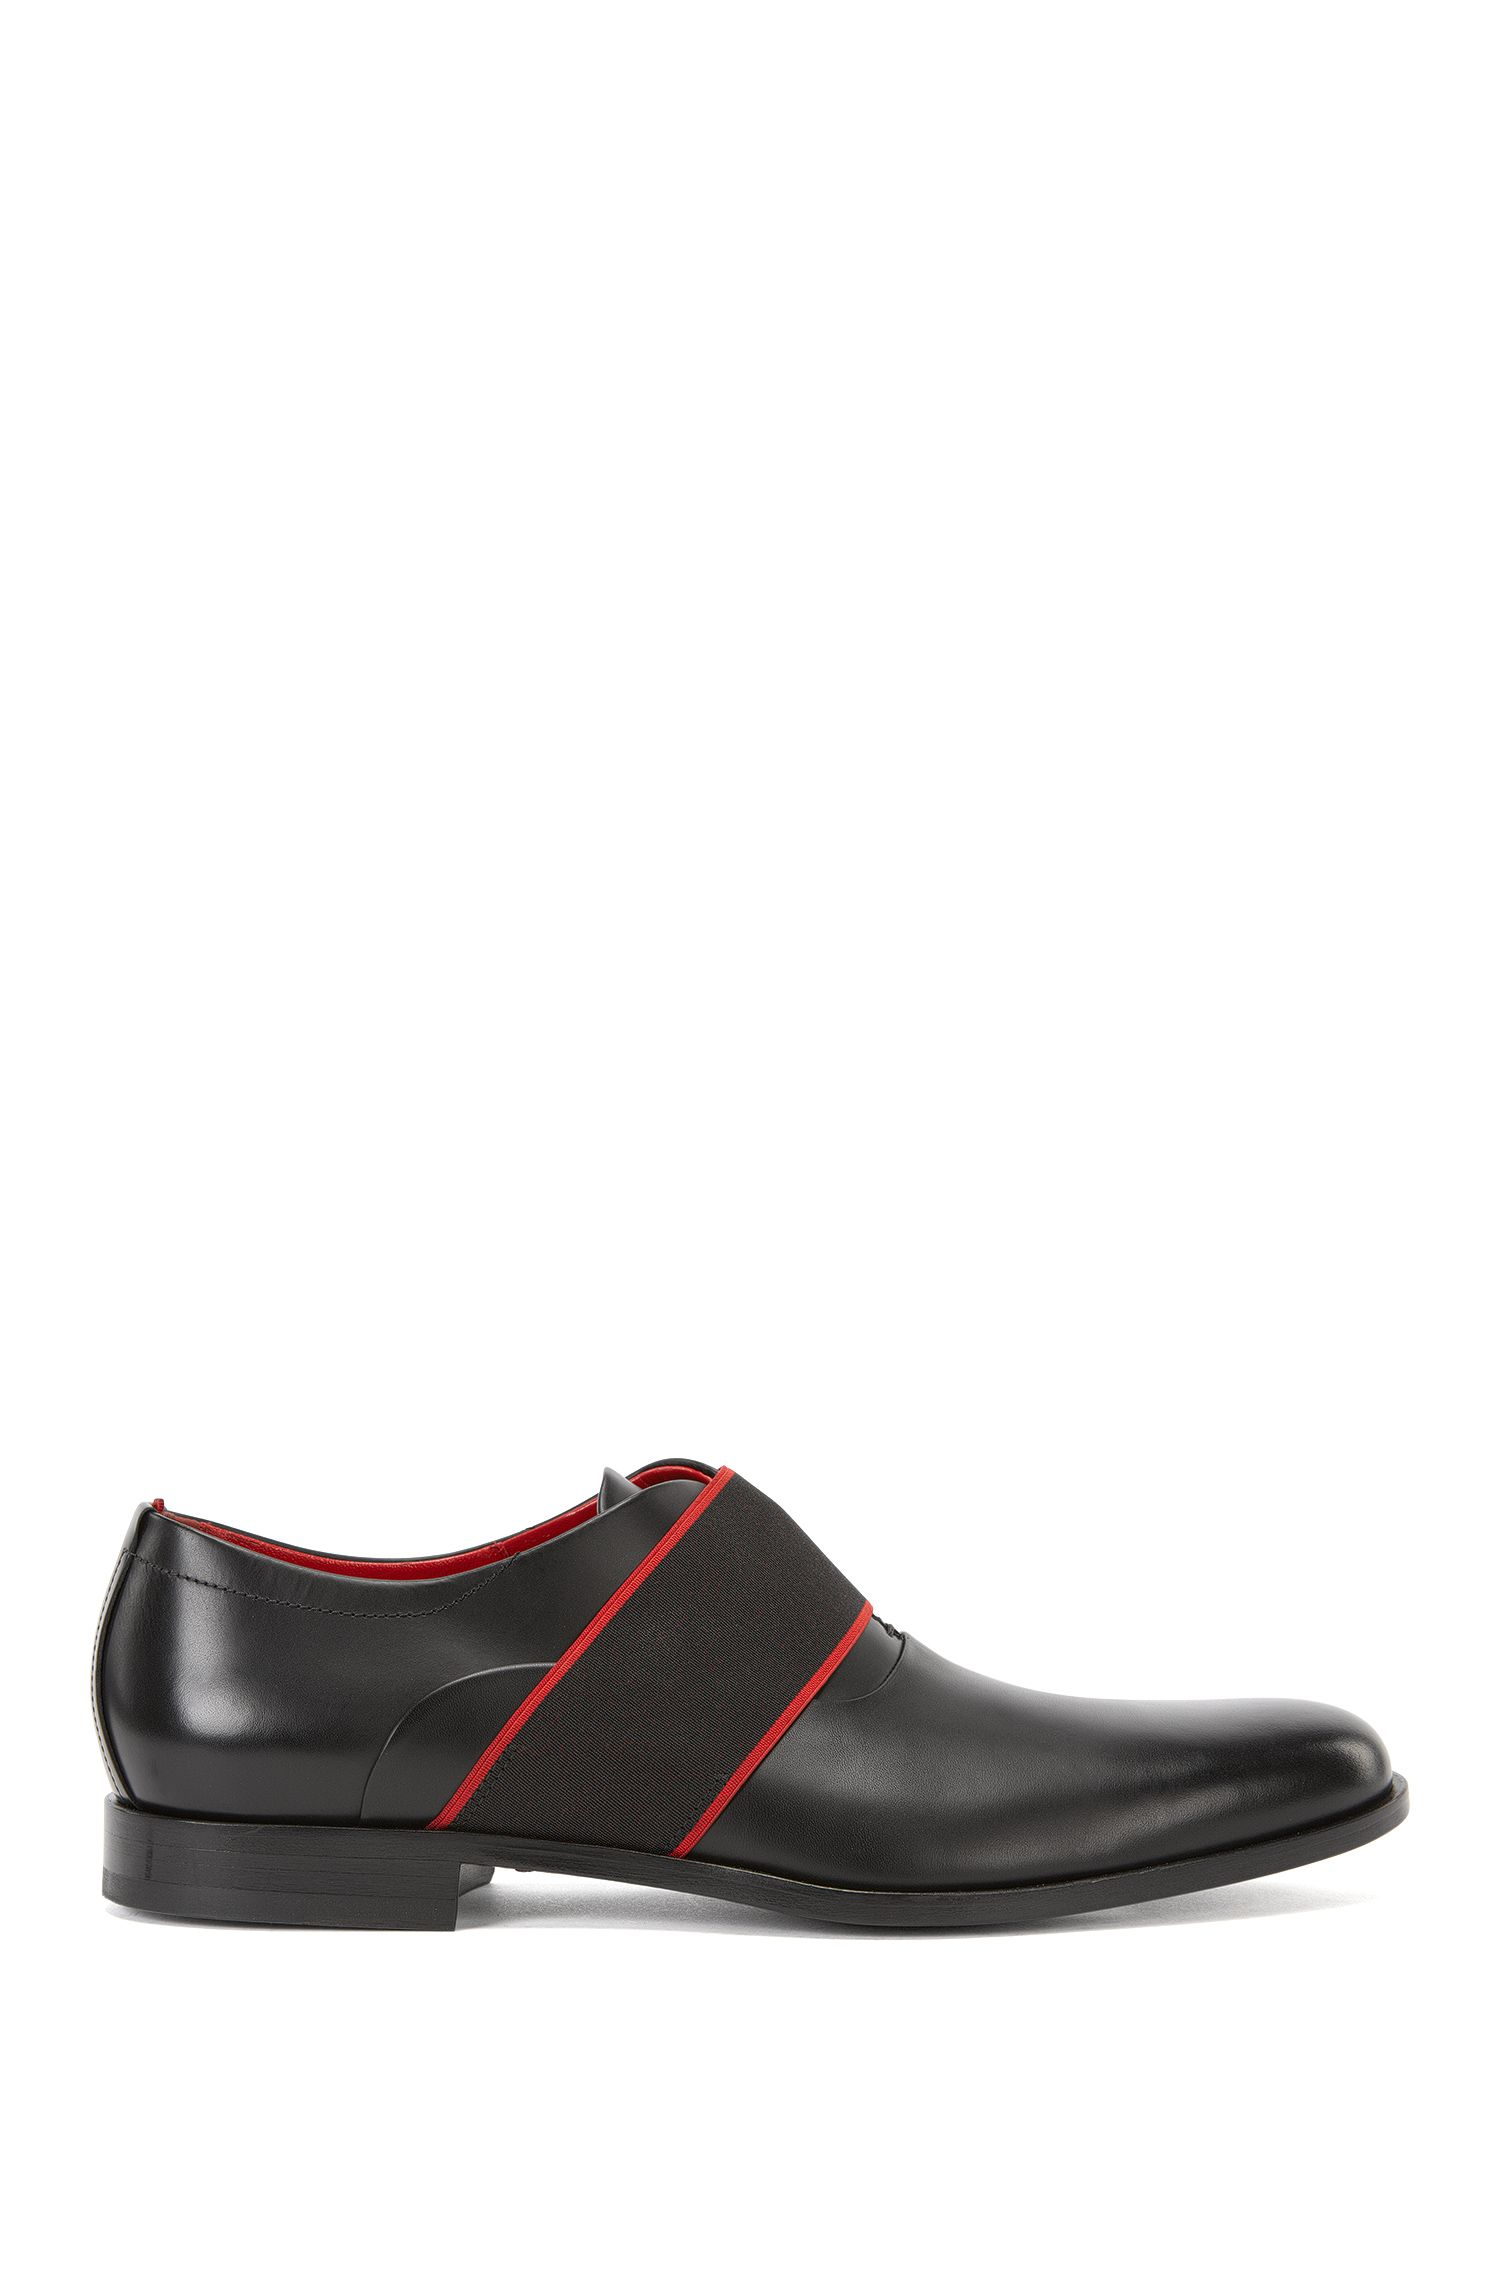 Leather Slip-On Dress Shoe | Sigma Slon Tp